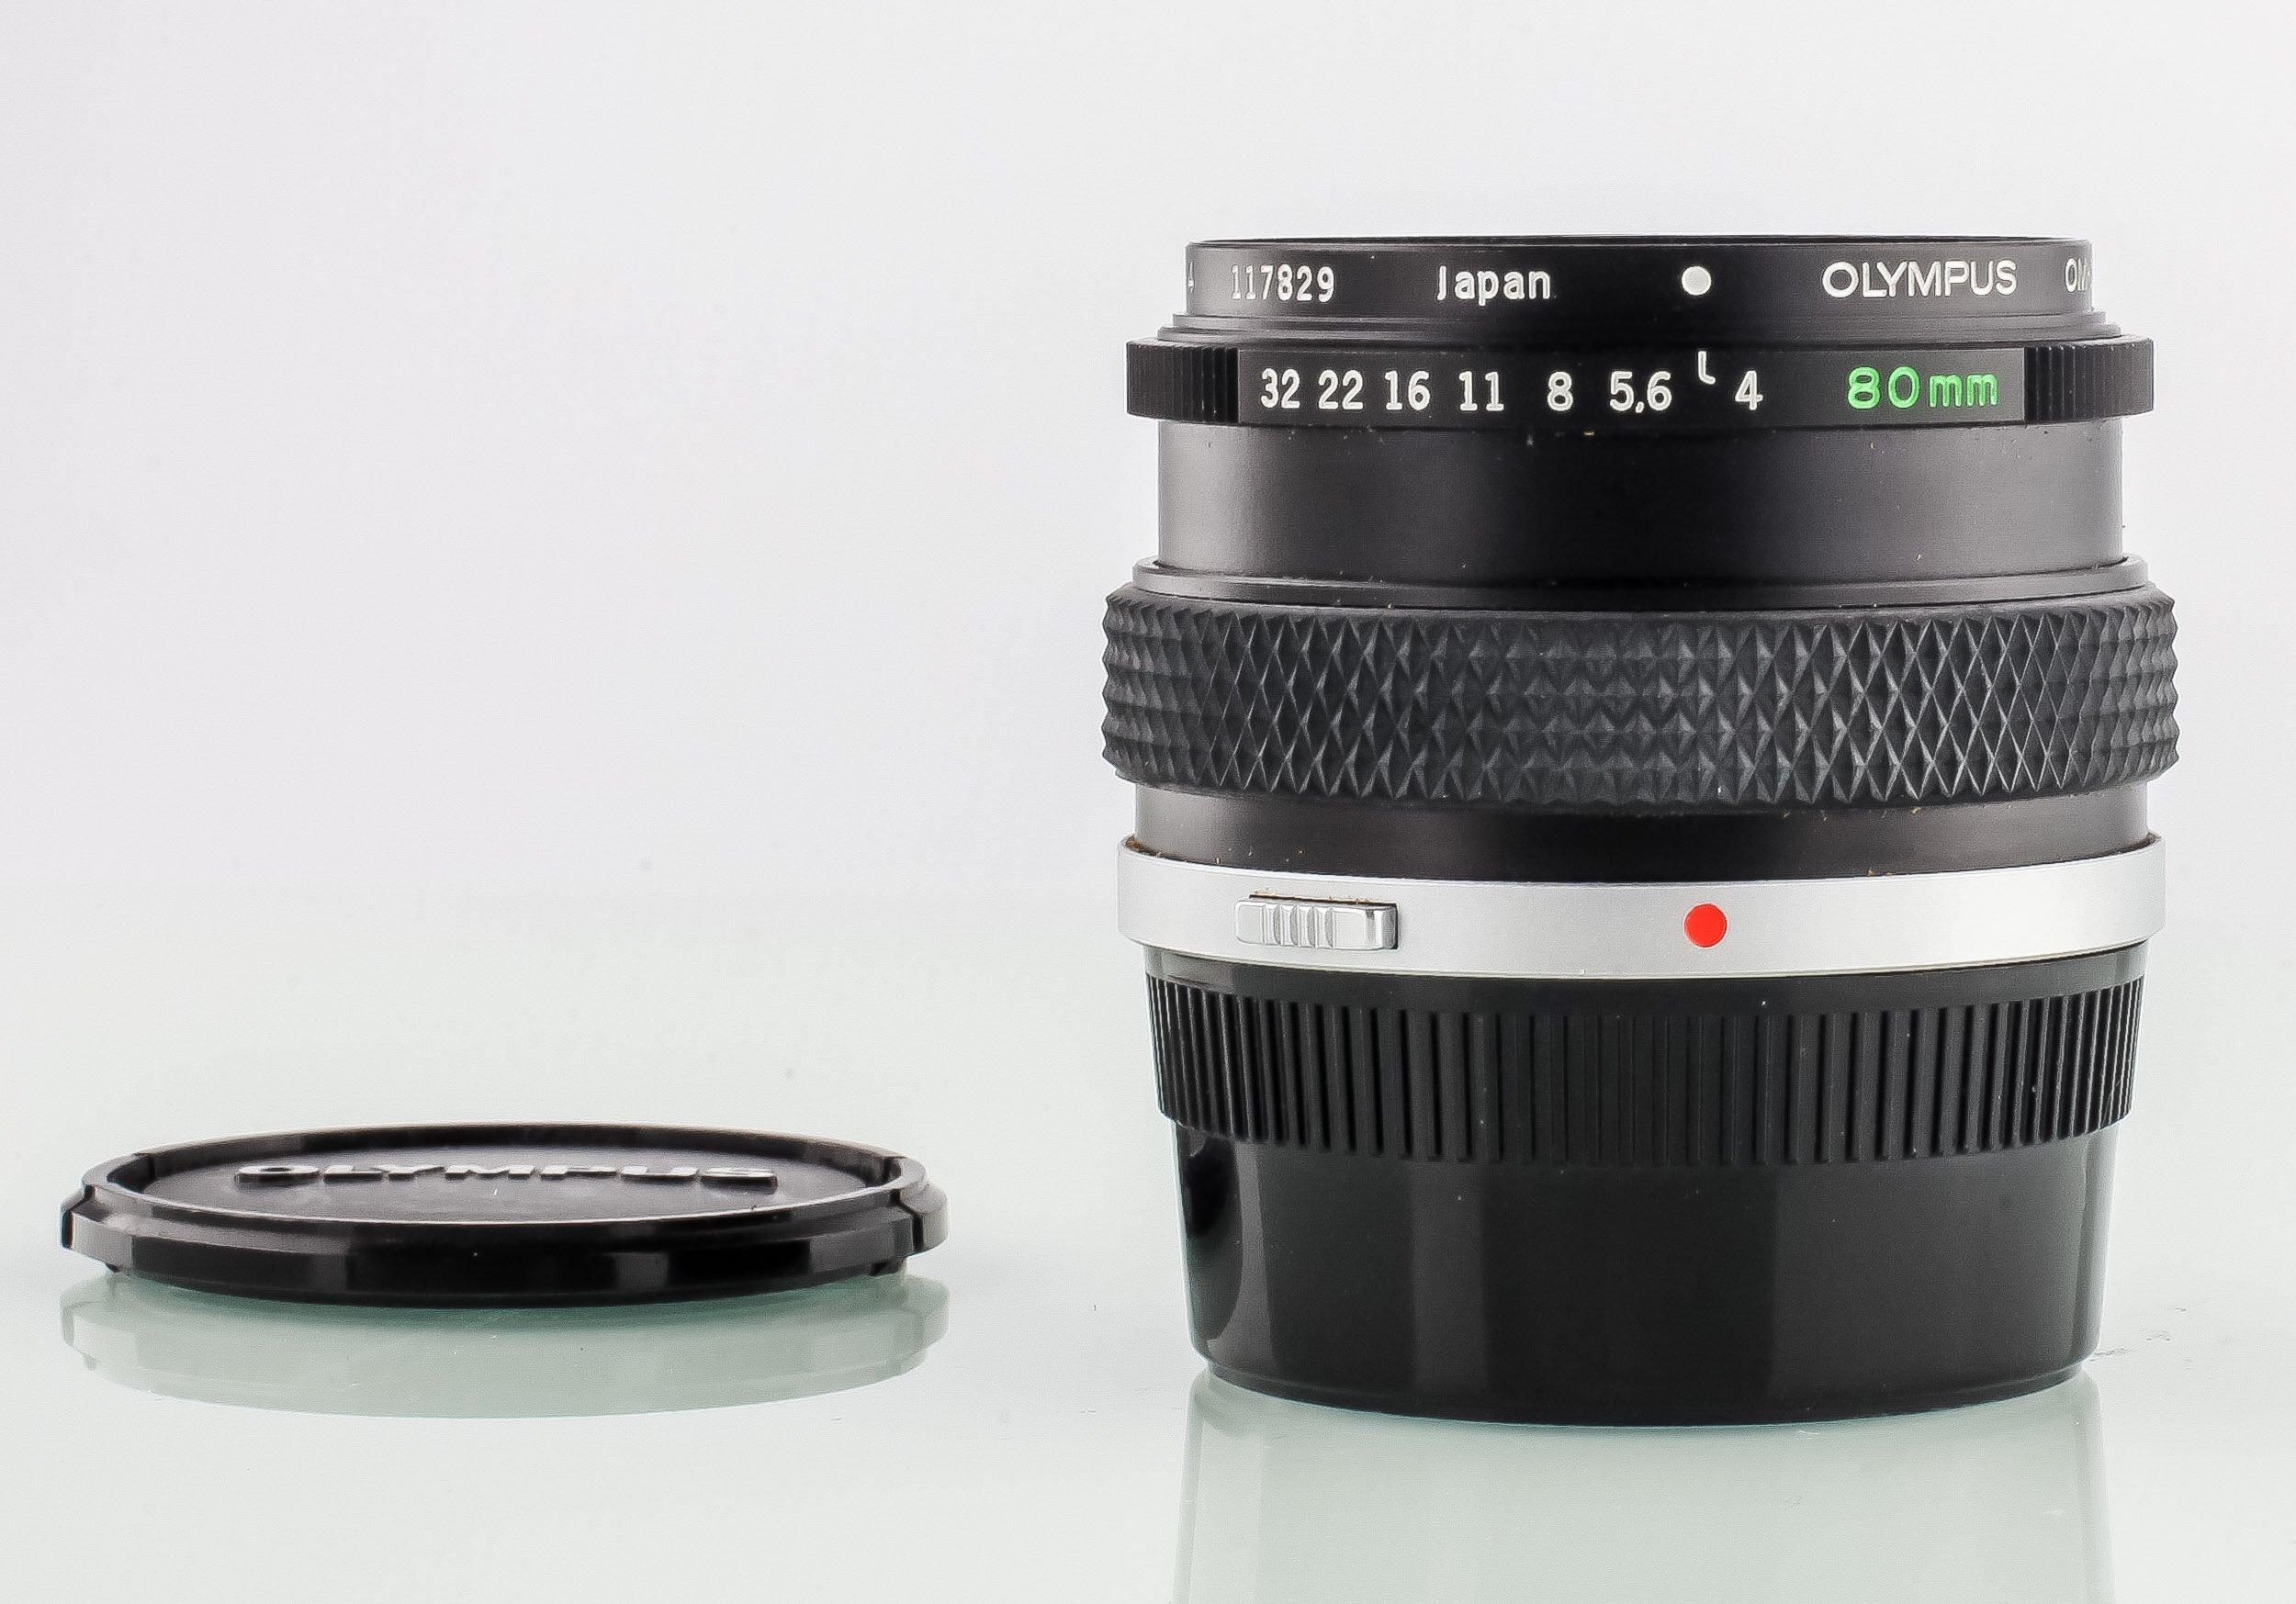 Olympus OM-System 1:1 Makro 80mm 4,0 Auto